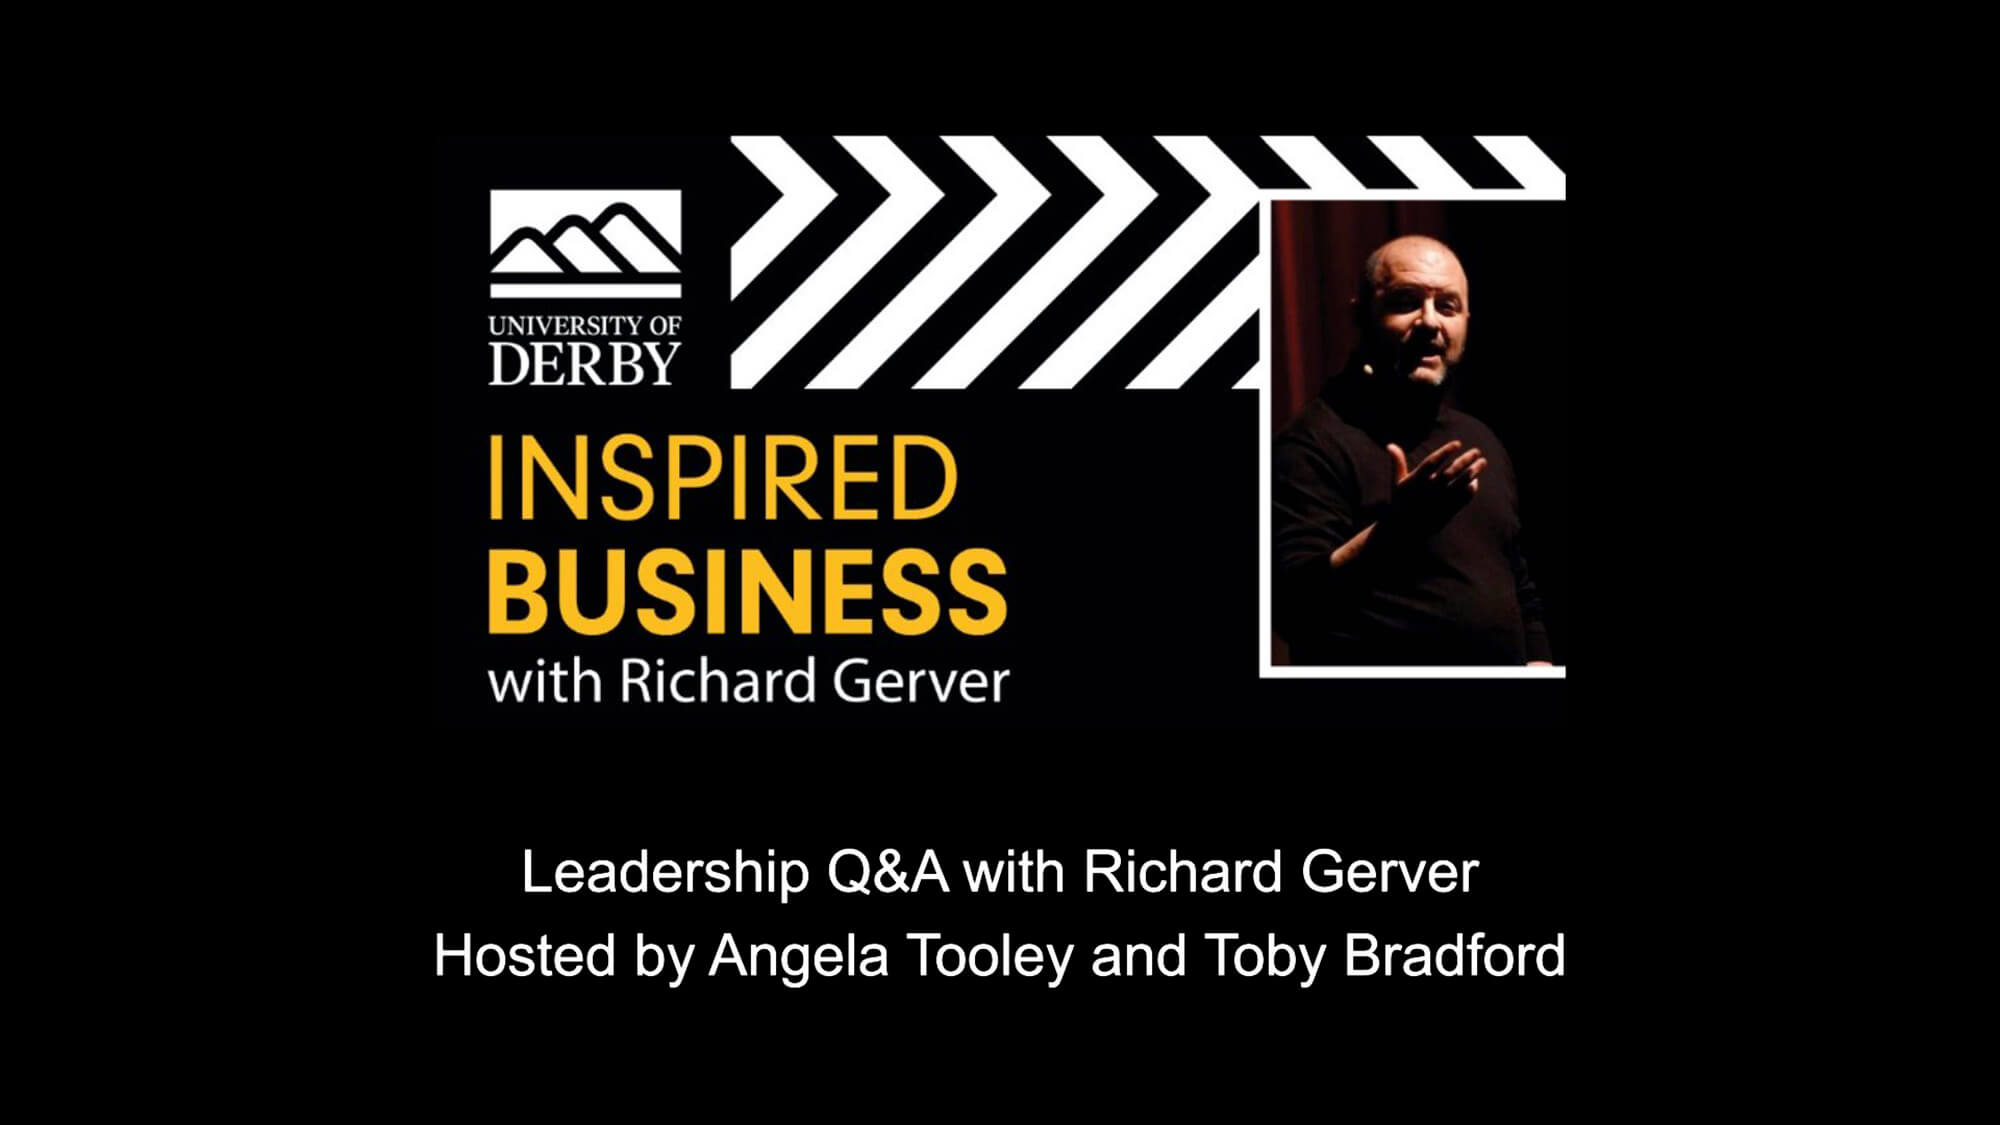 Leadership Q&A with Richard Gerver